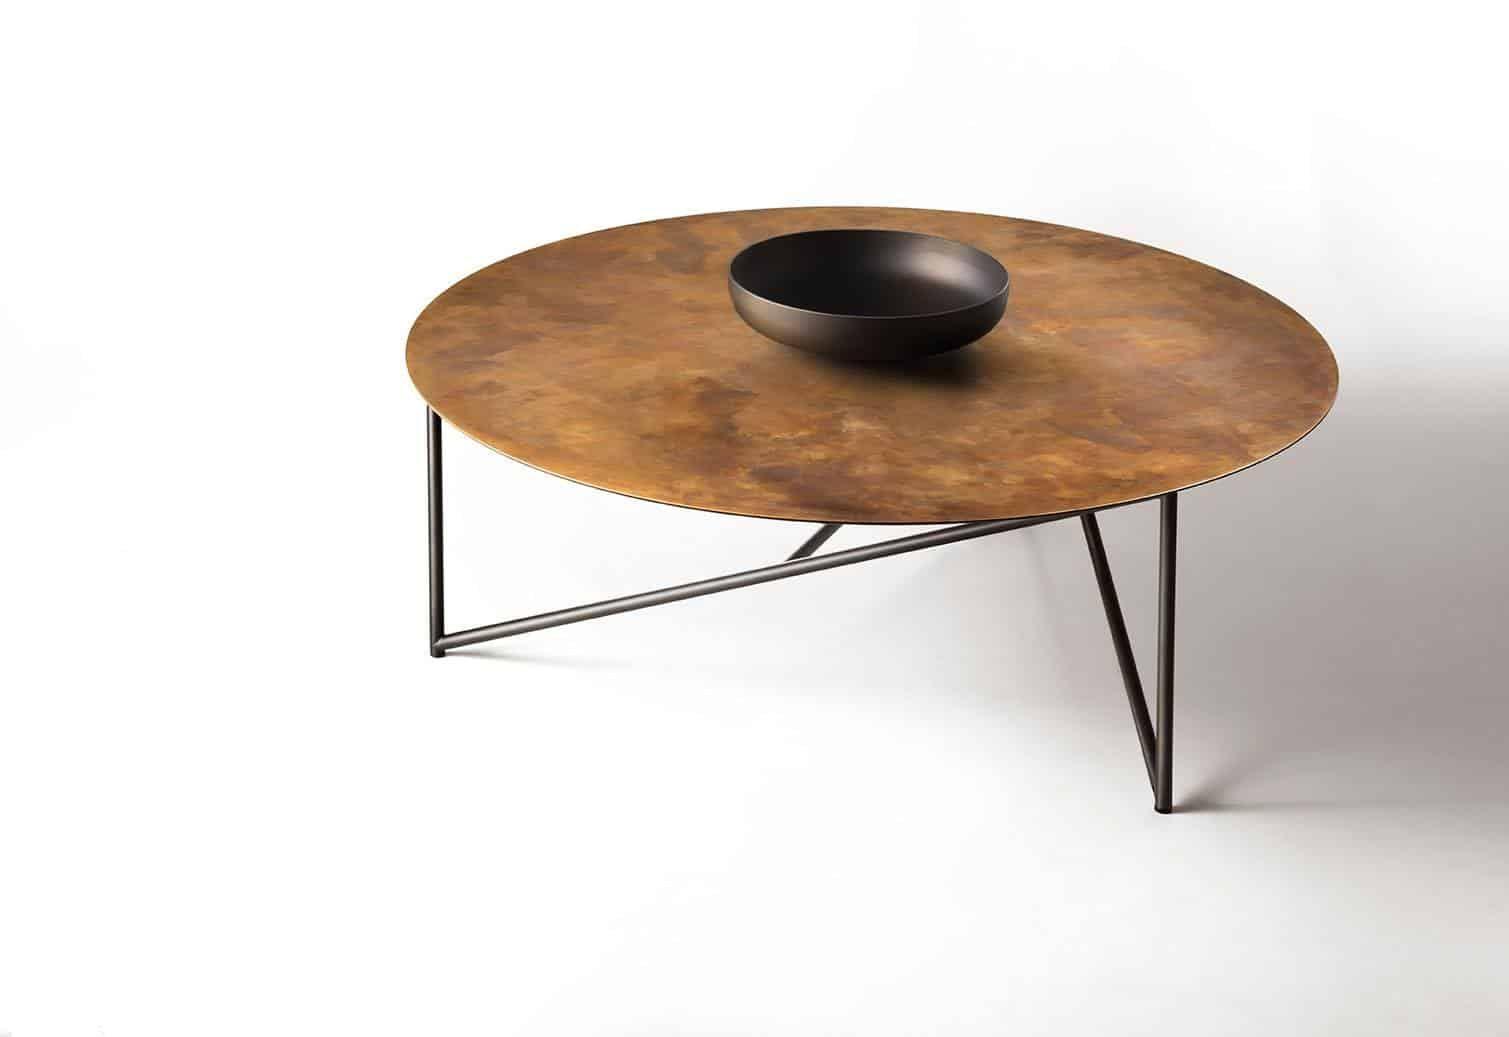 Italian Luxury Furniture Designer Furniture Singapore Da Vinci Lifestyle Coffee Table Interior Decoration Accessories Furniture Design [ 1037 x 1509 Pixel ]